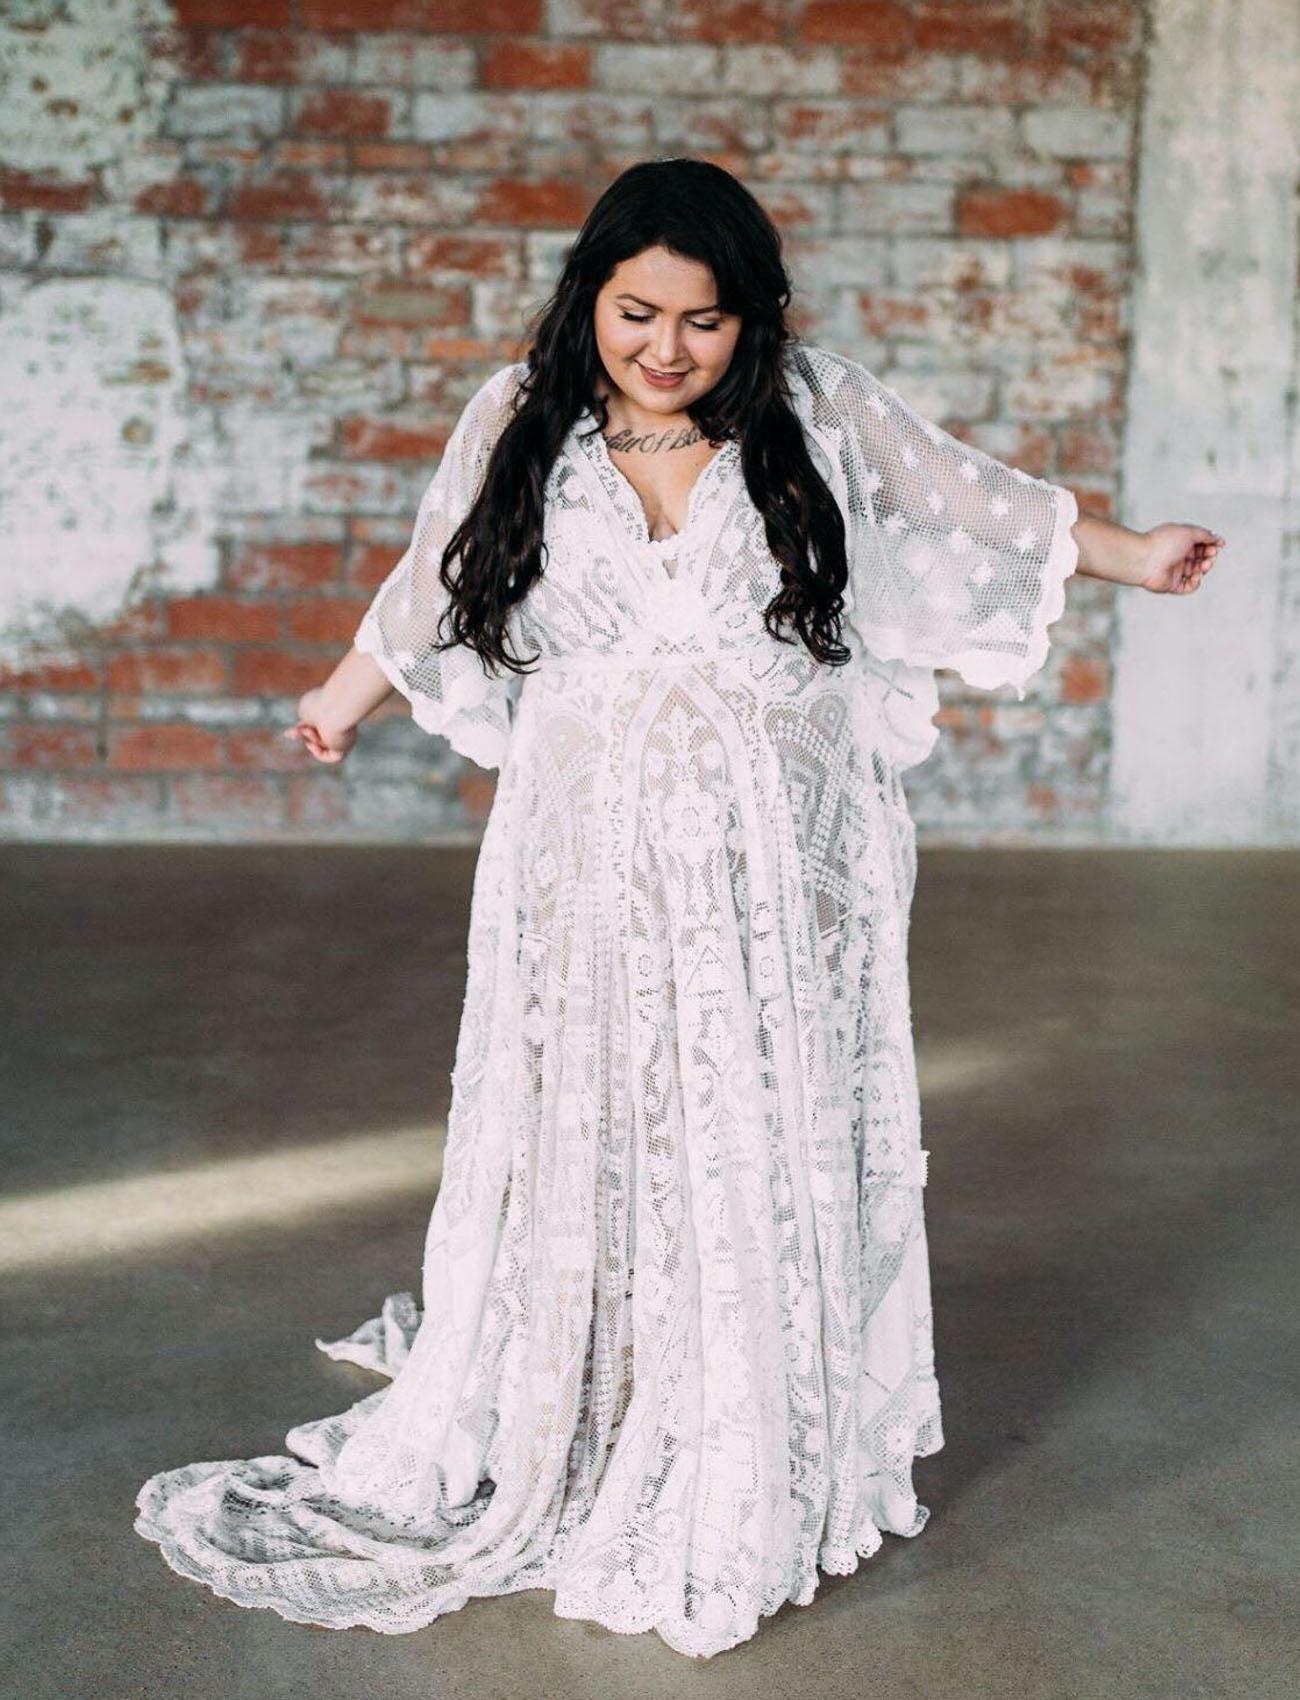 She's More than Magic Boho Wedding Dress